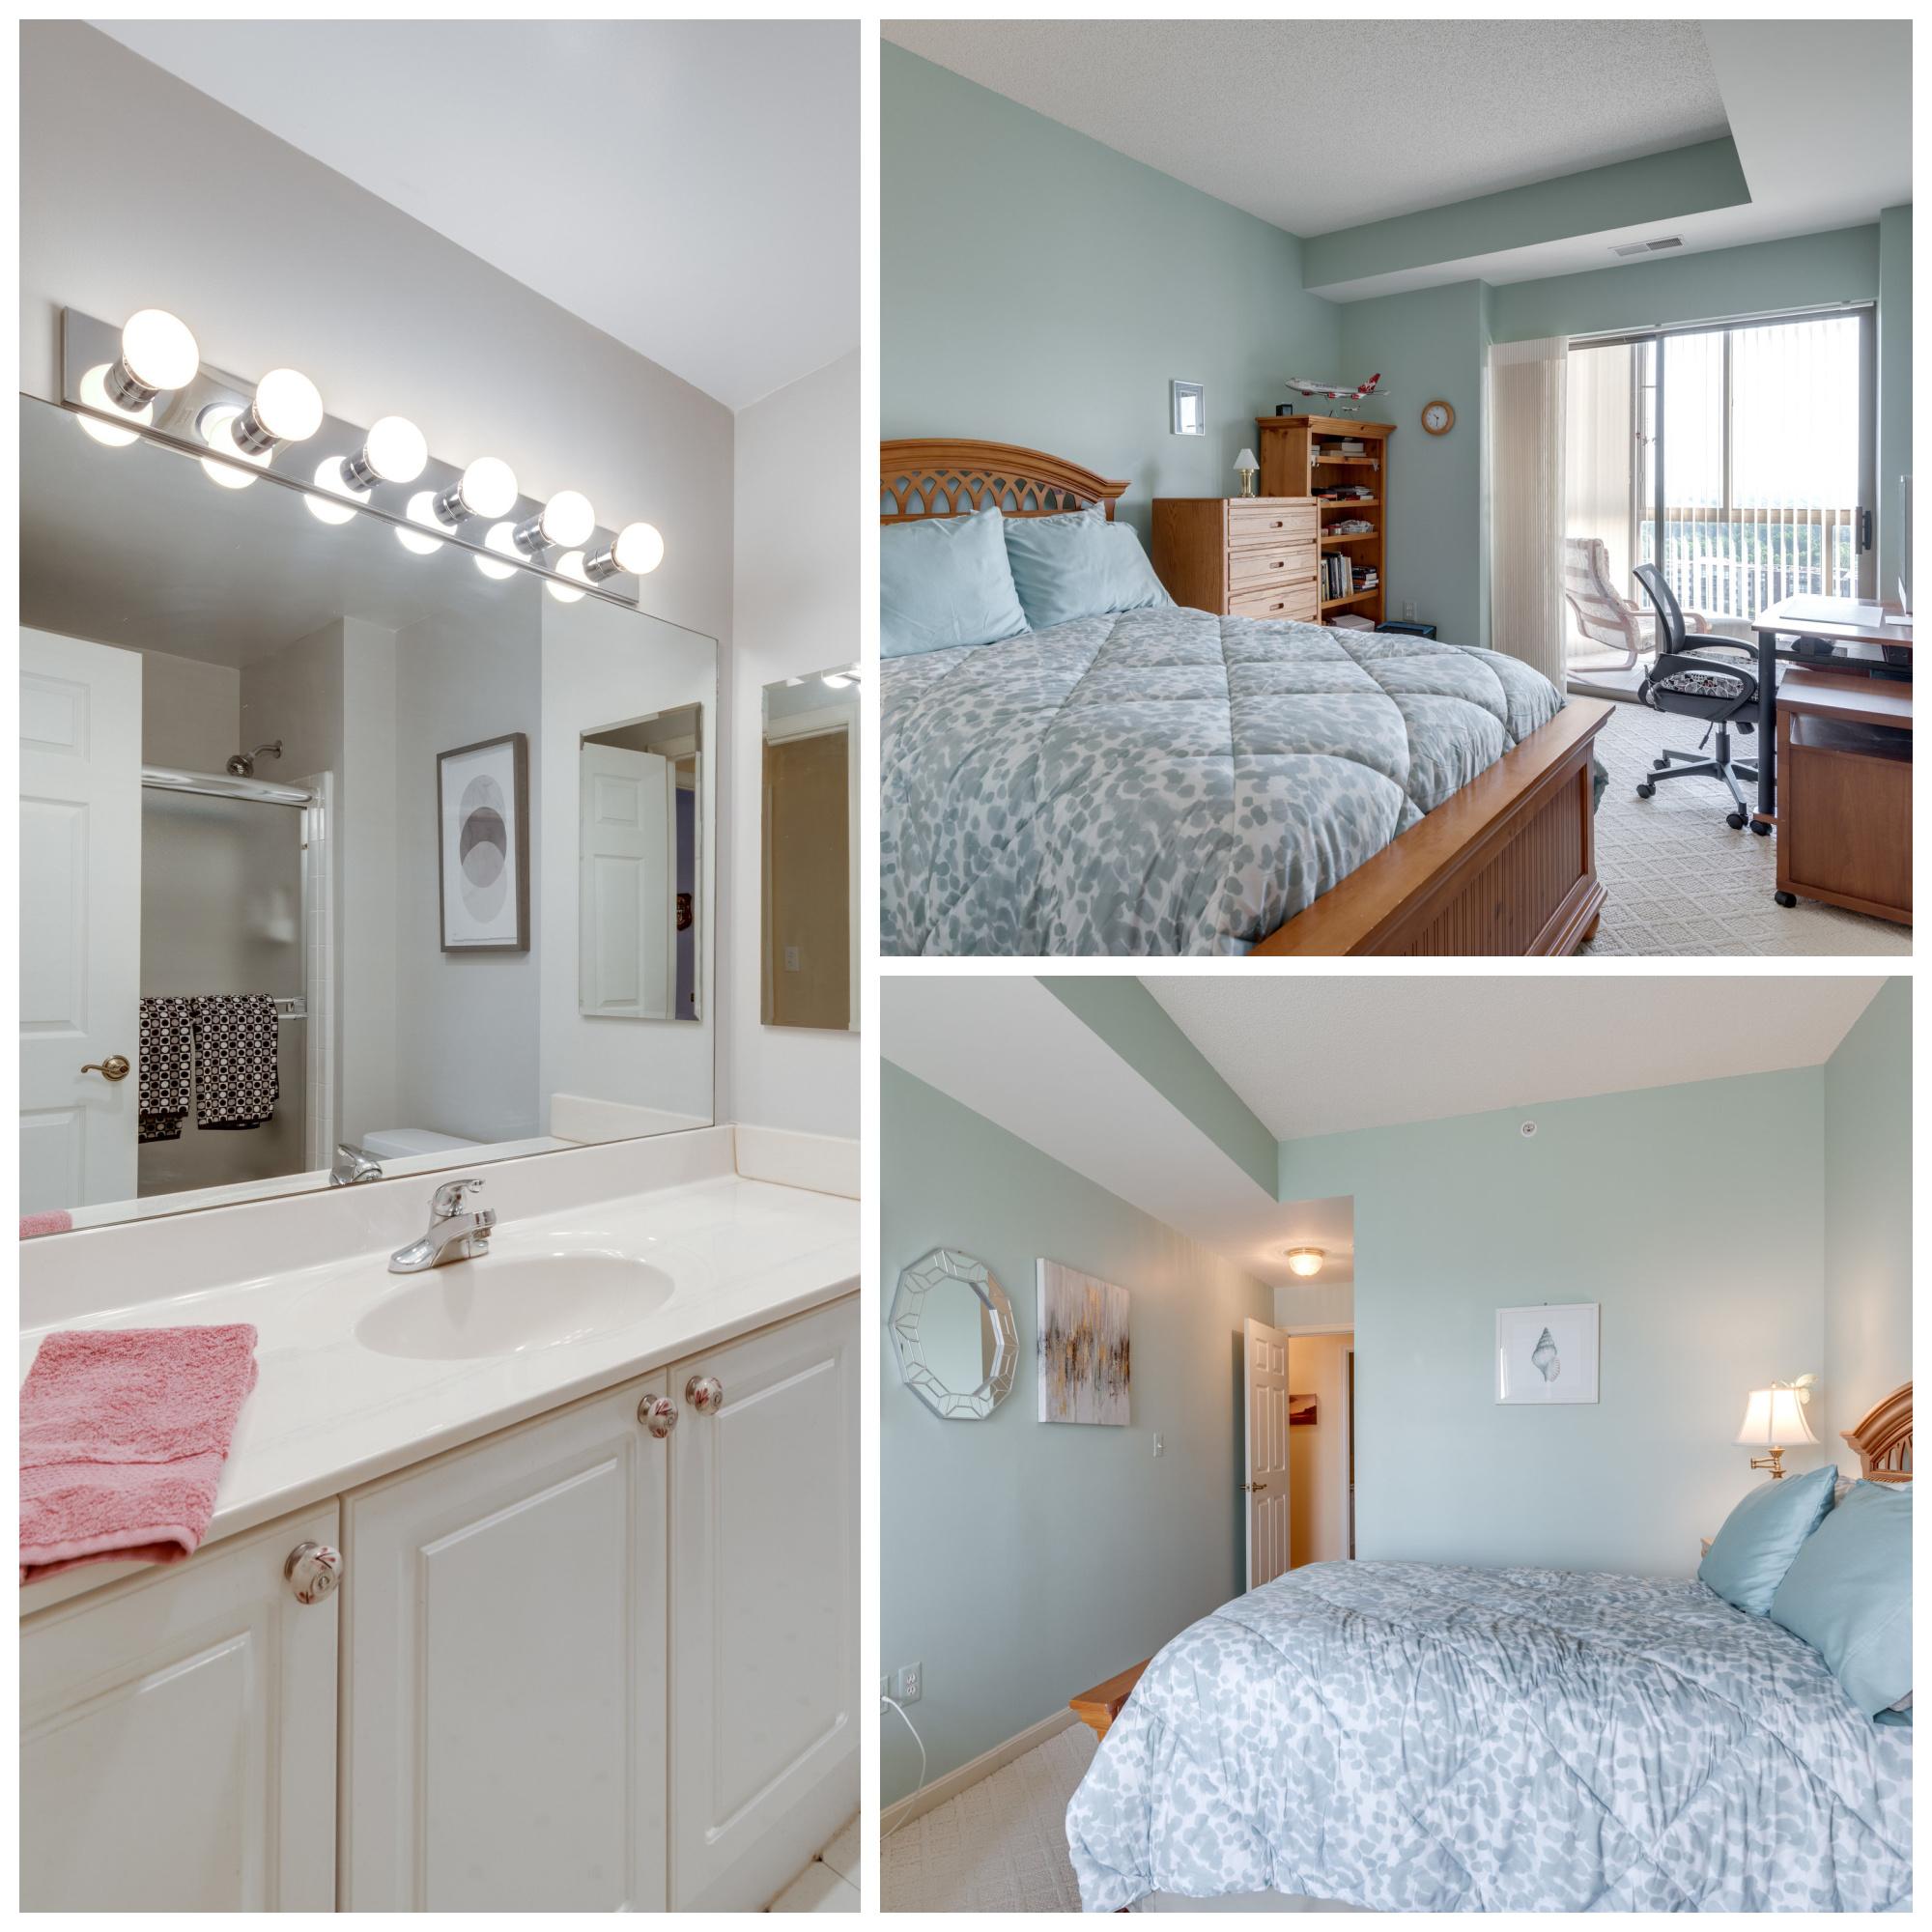 19375 Cypress Ridge Ter #1116, Lansdowne Woods- Additional Bedroom and Bath